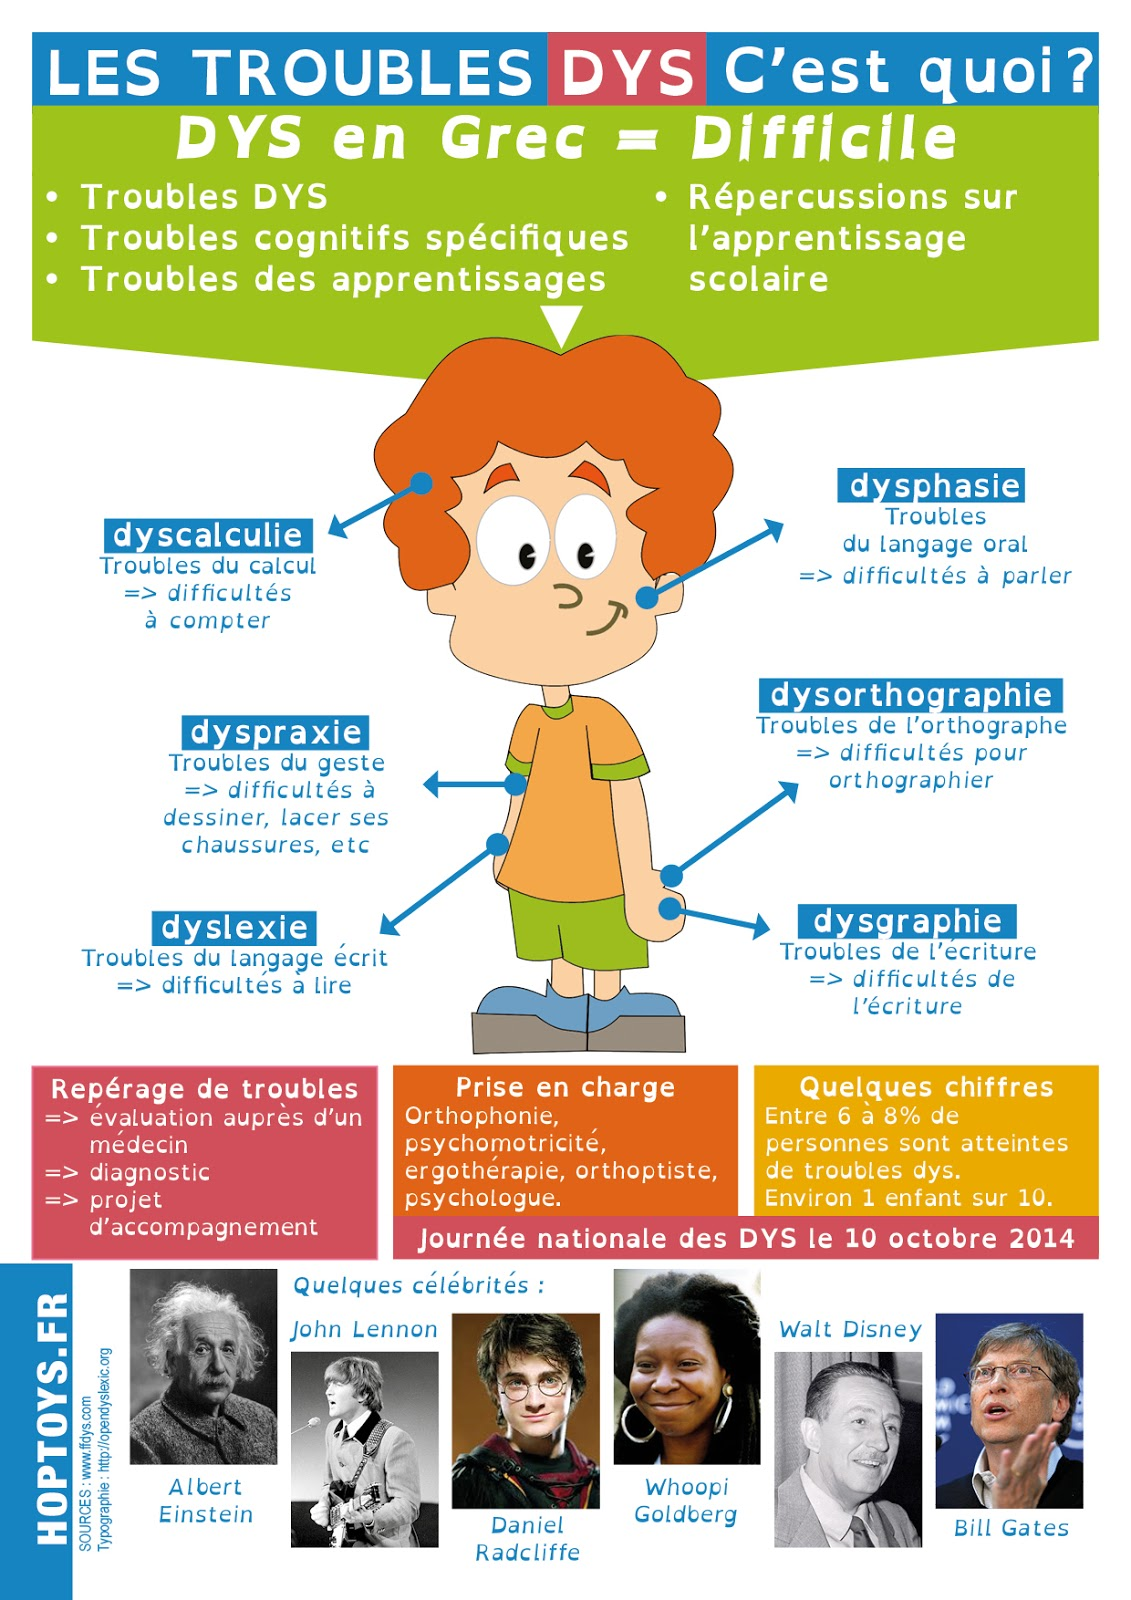 https://www.bloghoptoys.fr/infographie-les-troubles-dys